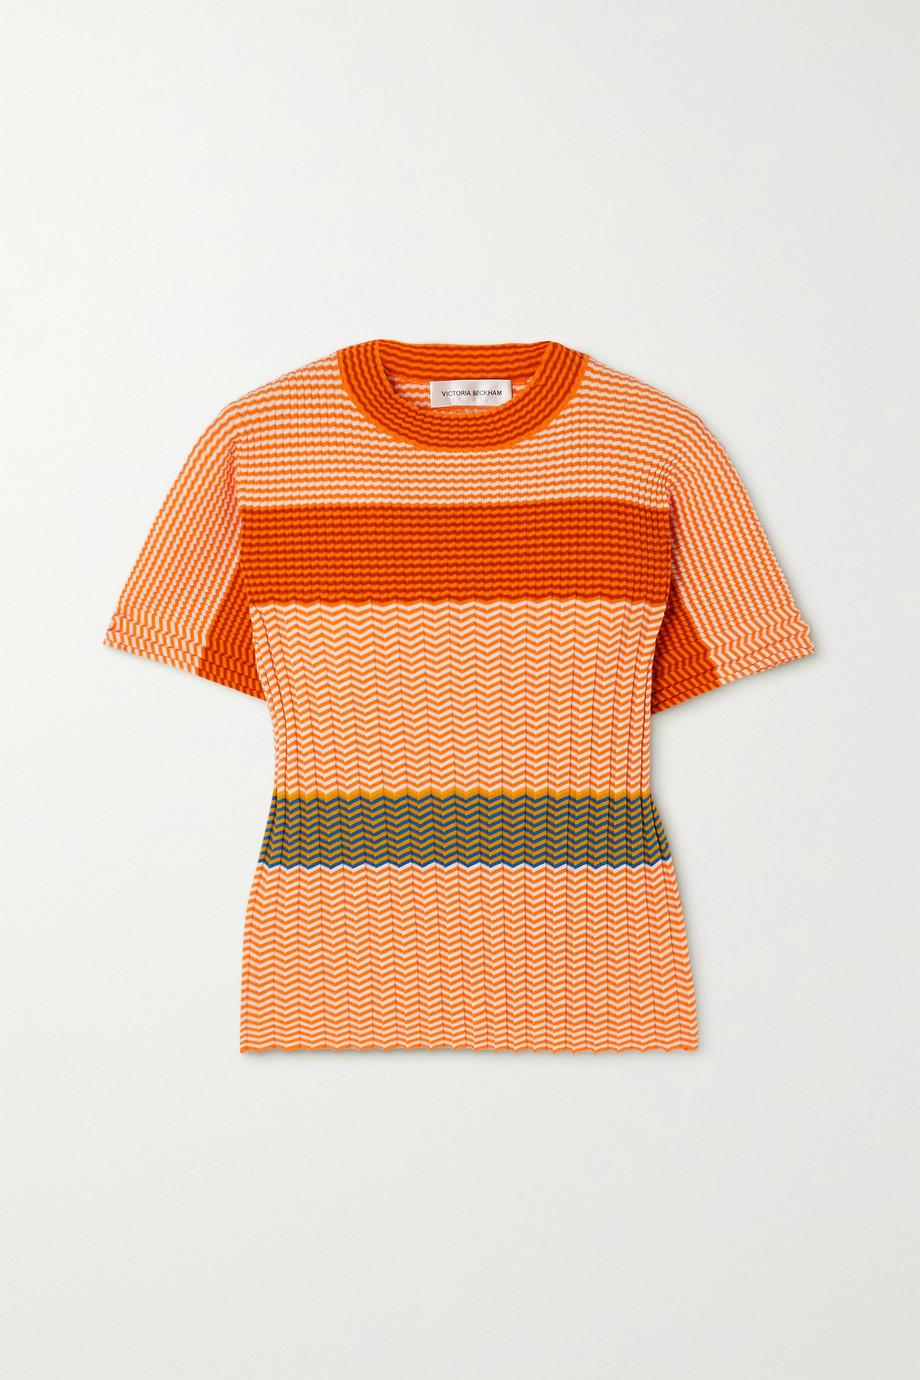 Victoria Beckham Striped ribbed cotton T-shirt